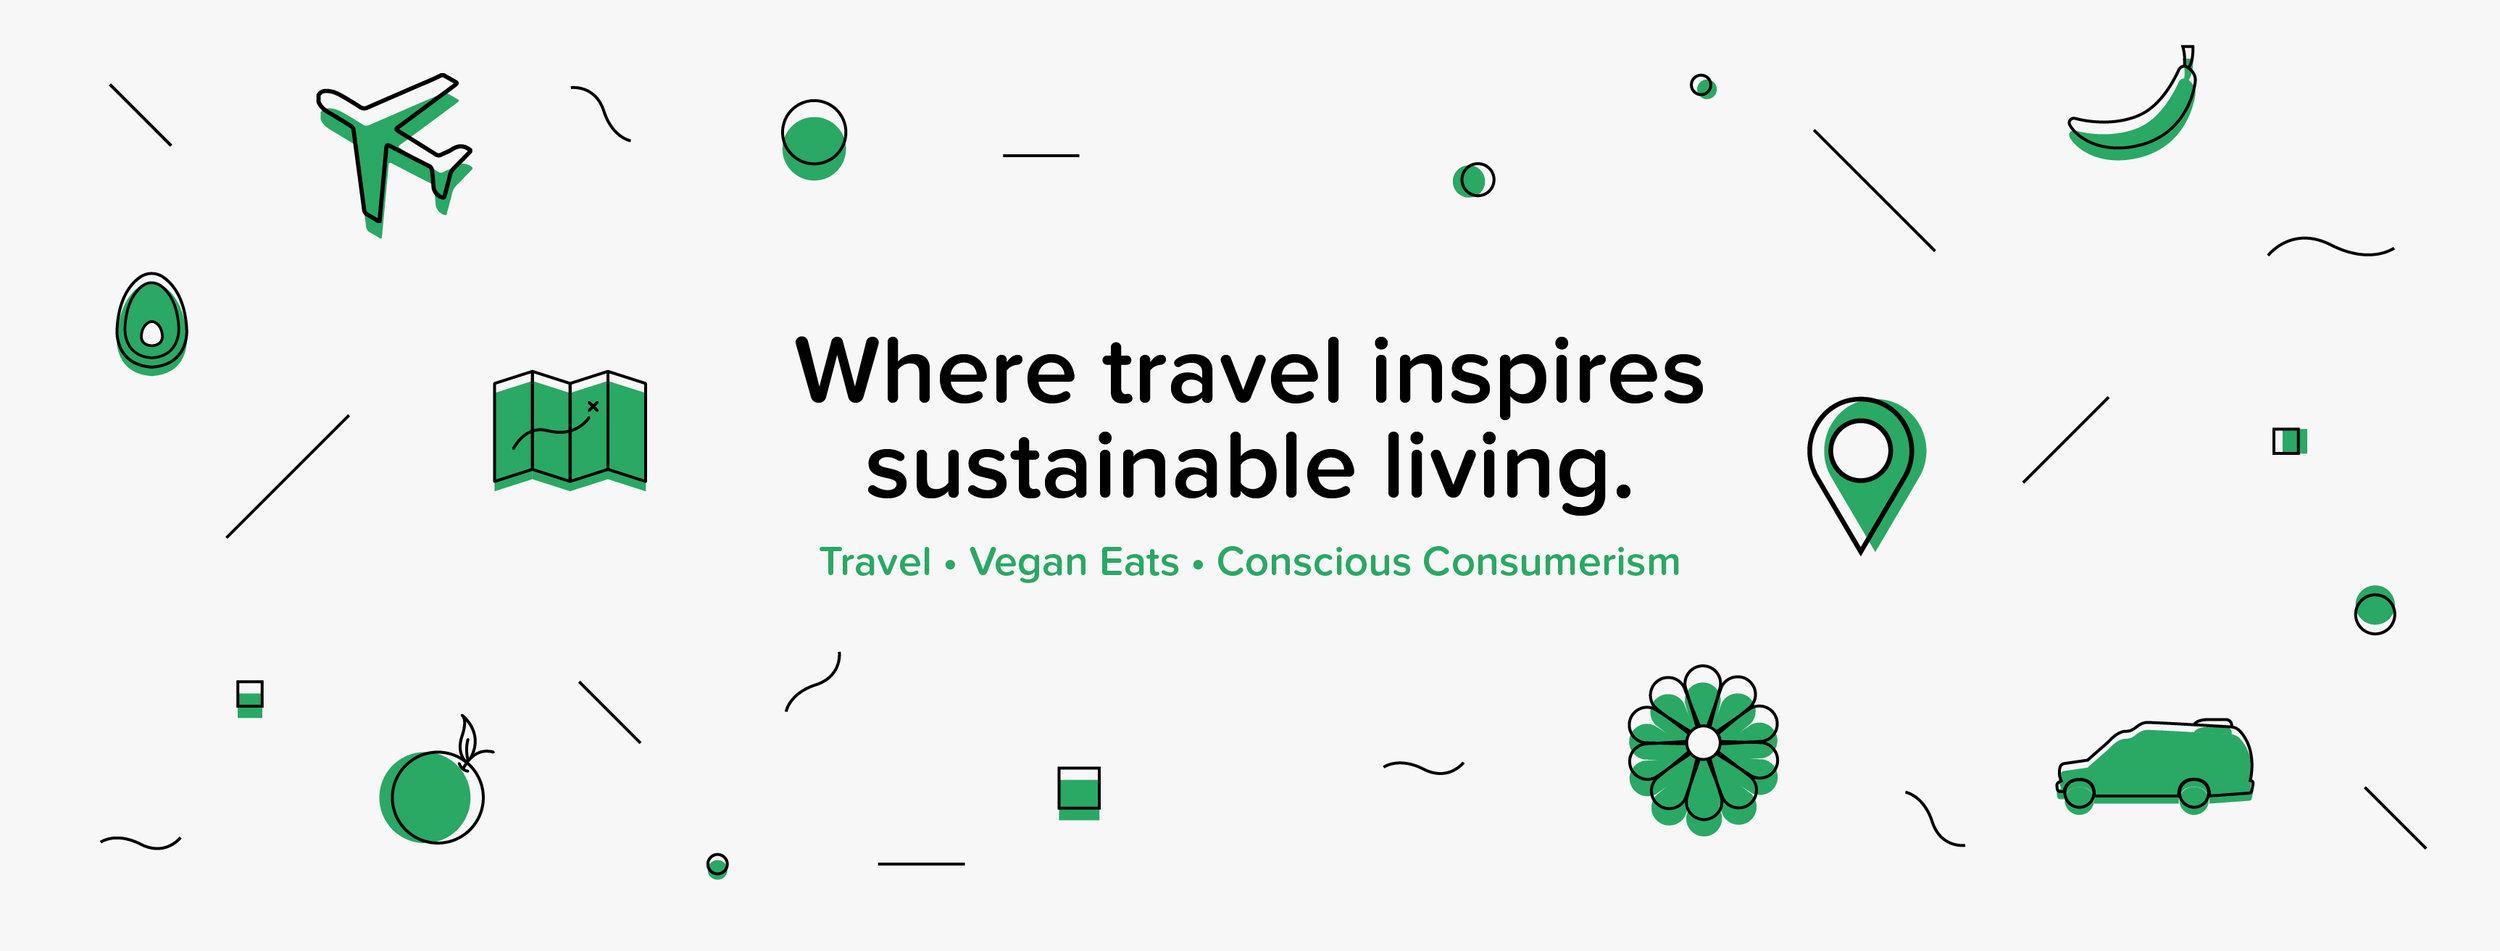 Travel & Vegan Living